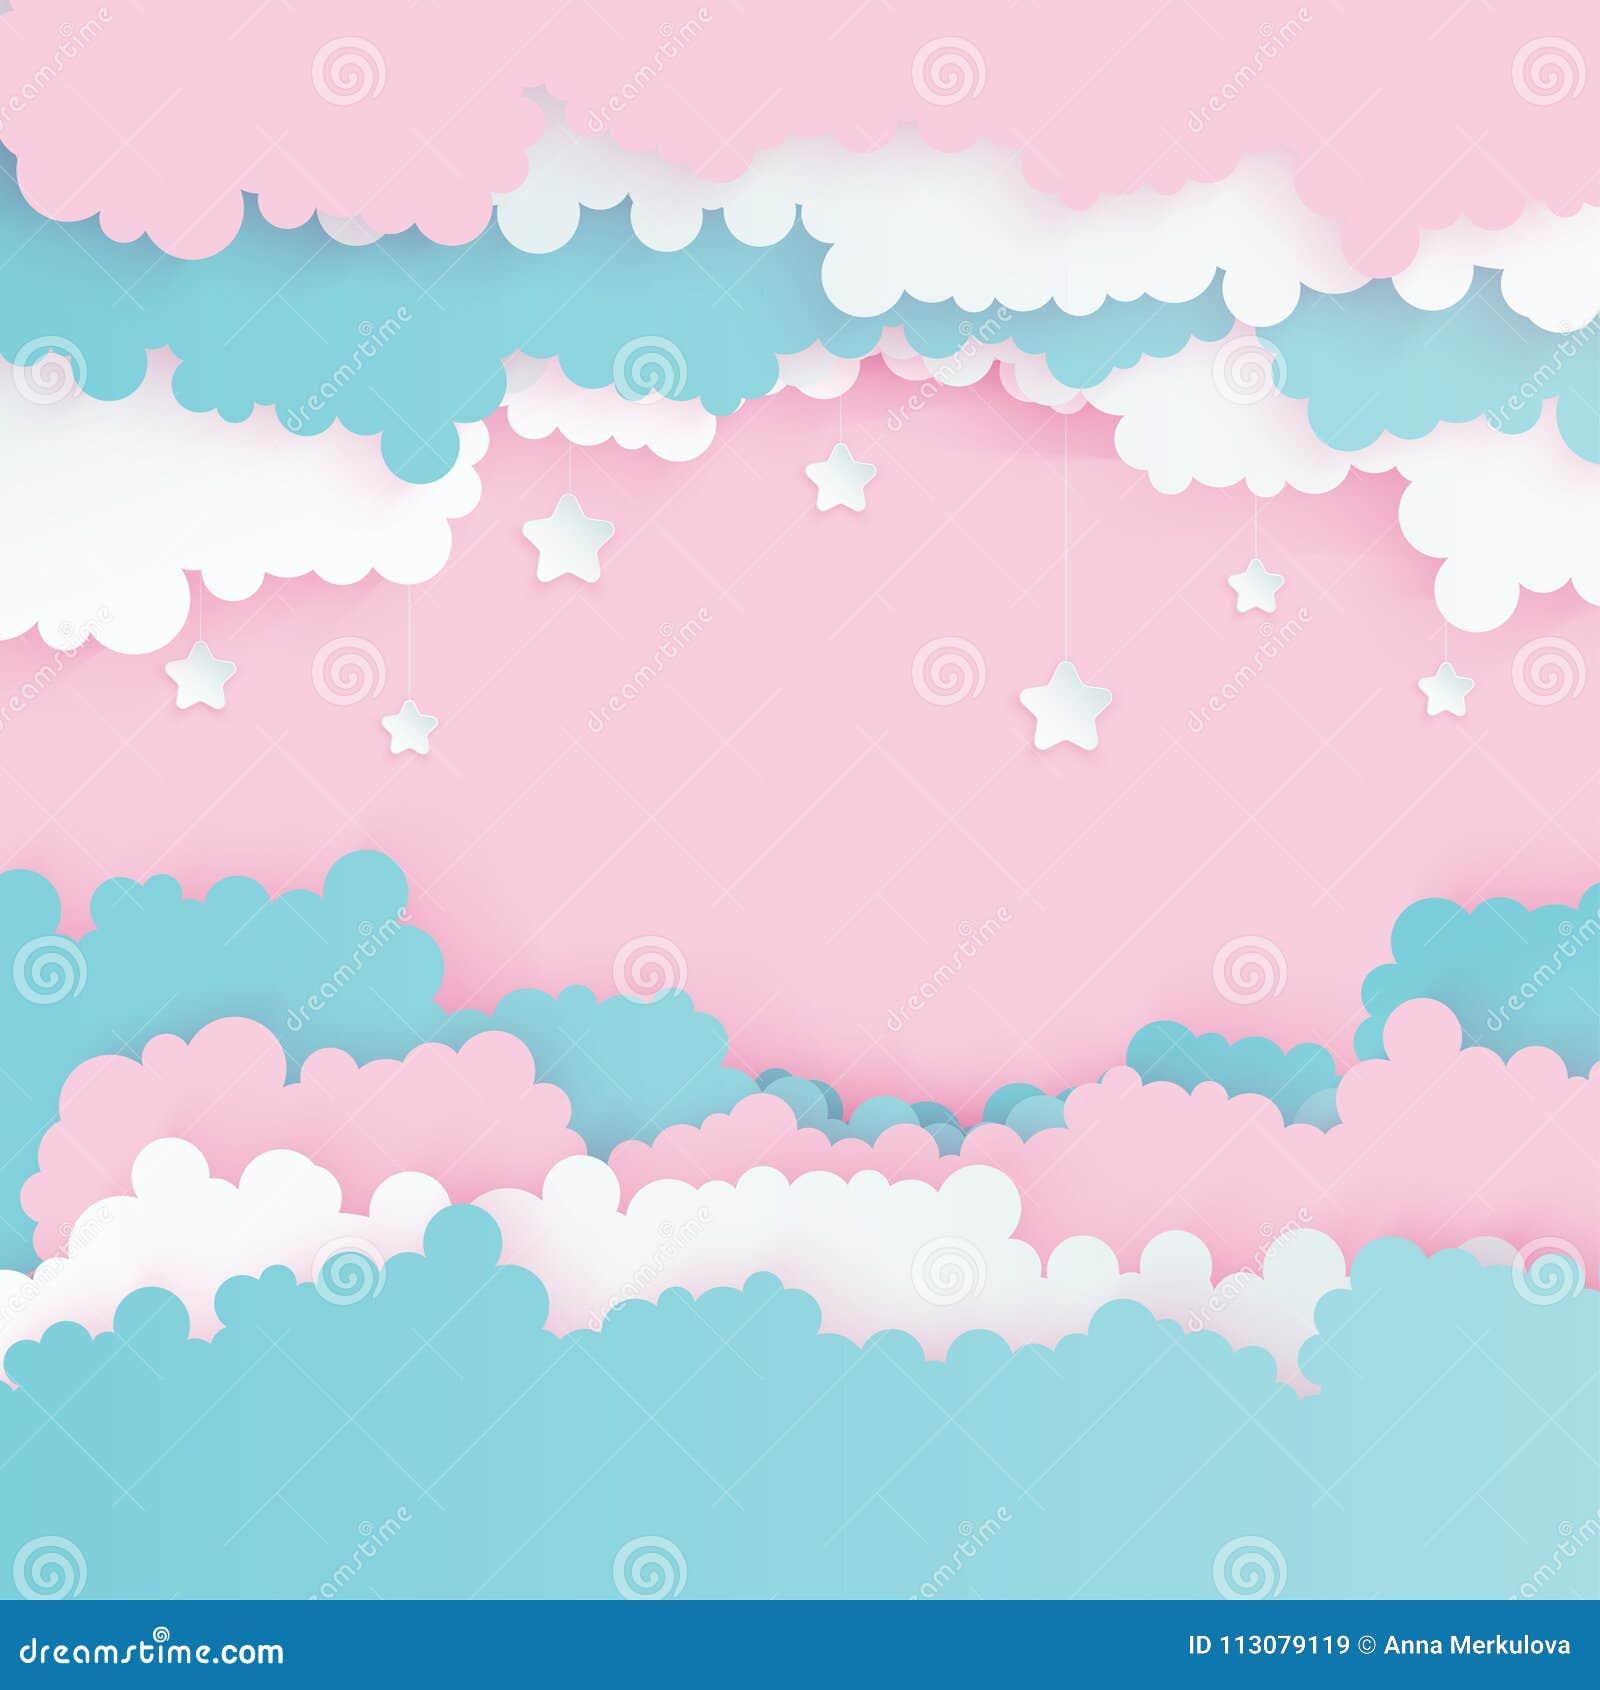 modern paper art clouds with stars cute cartoon sky stock vector